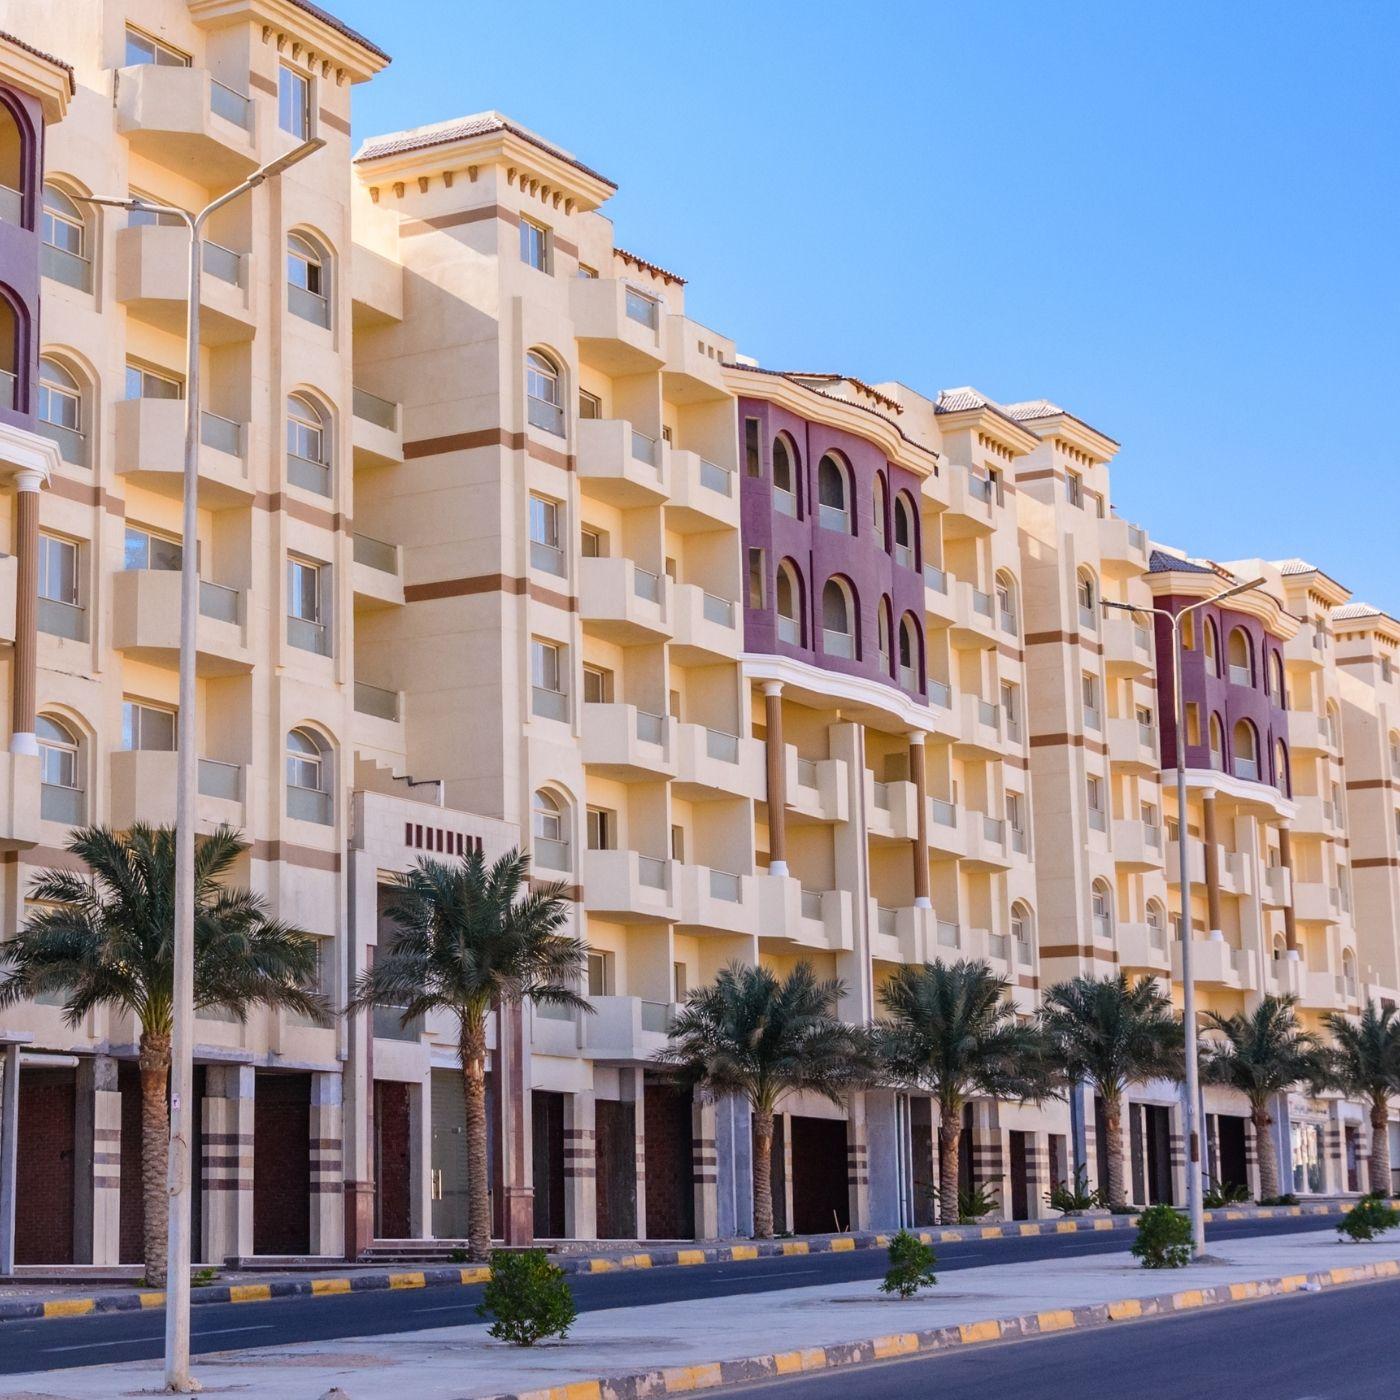 Apartments in Hurghada